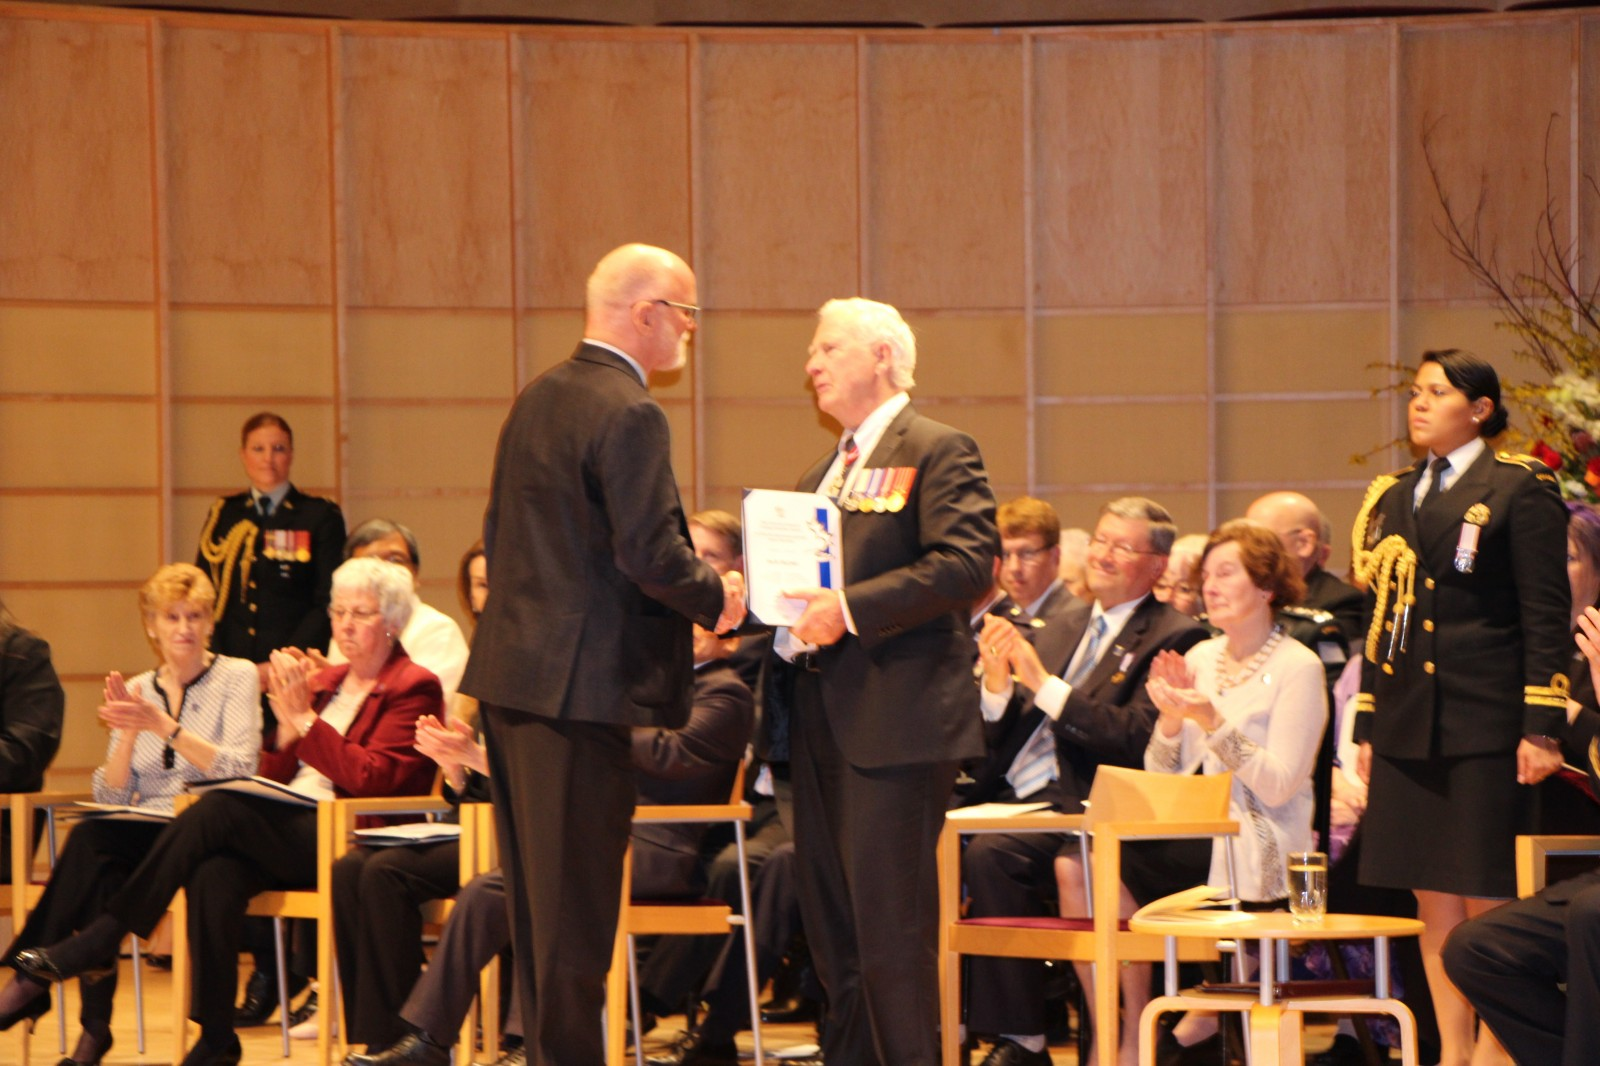 Governor General Presenting Award